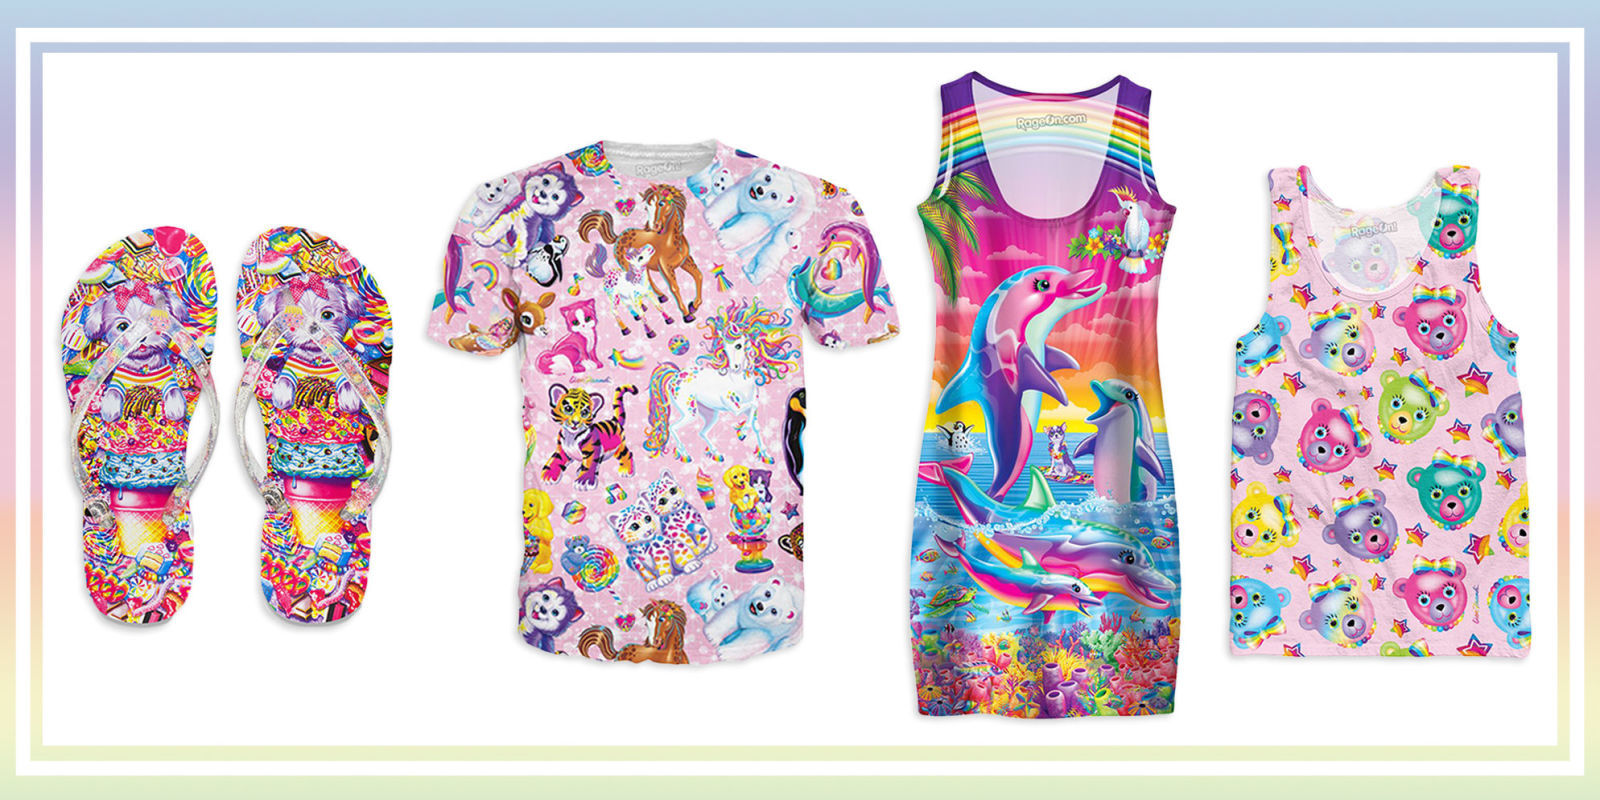 10 Best Lisa Frank Clothes 2017 Lisa Frank Tops